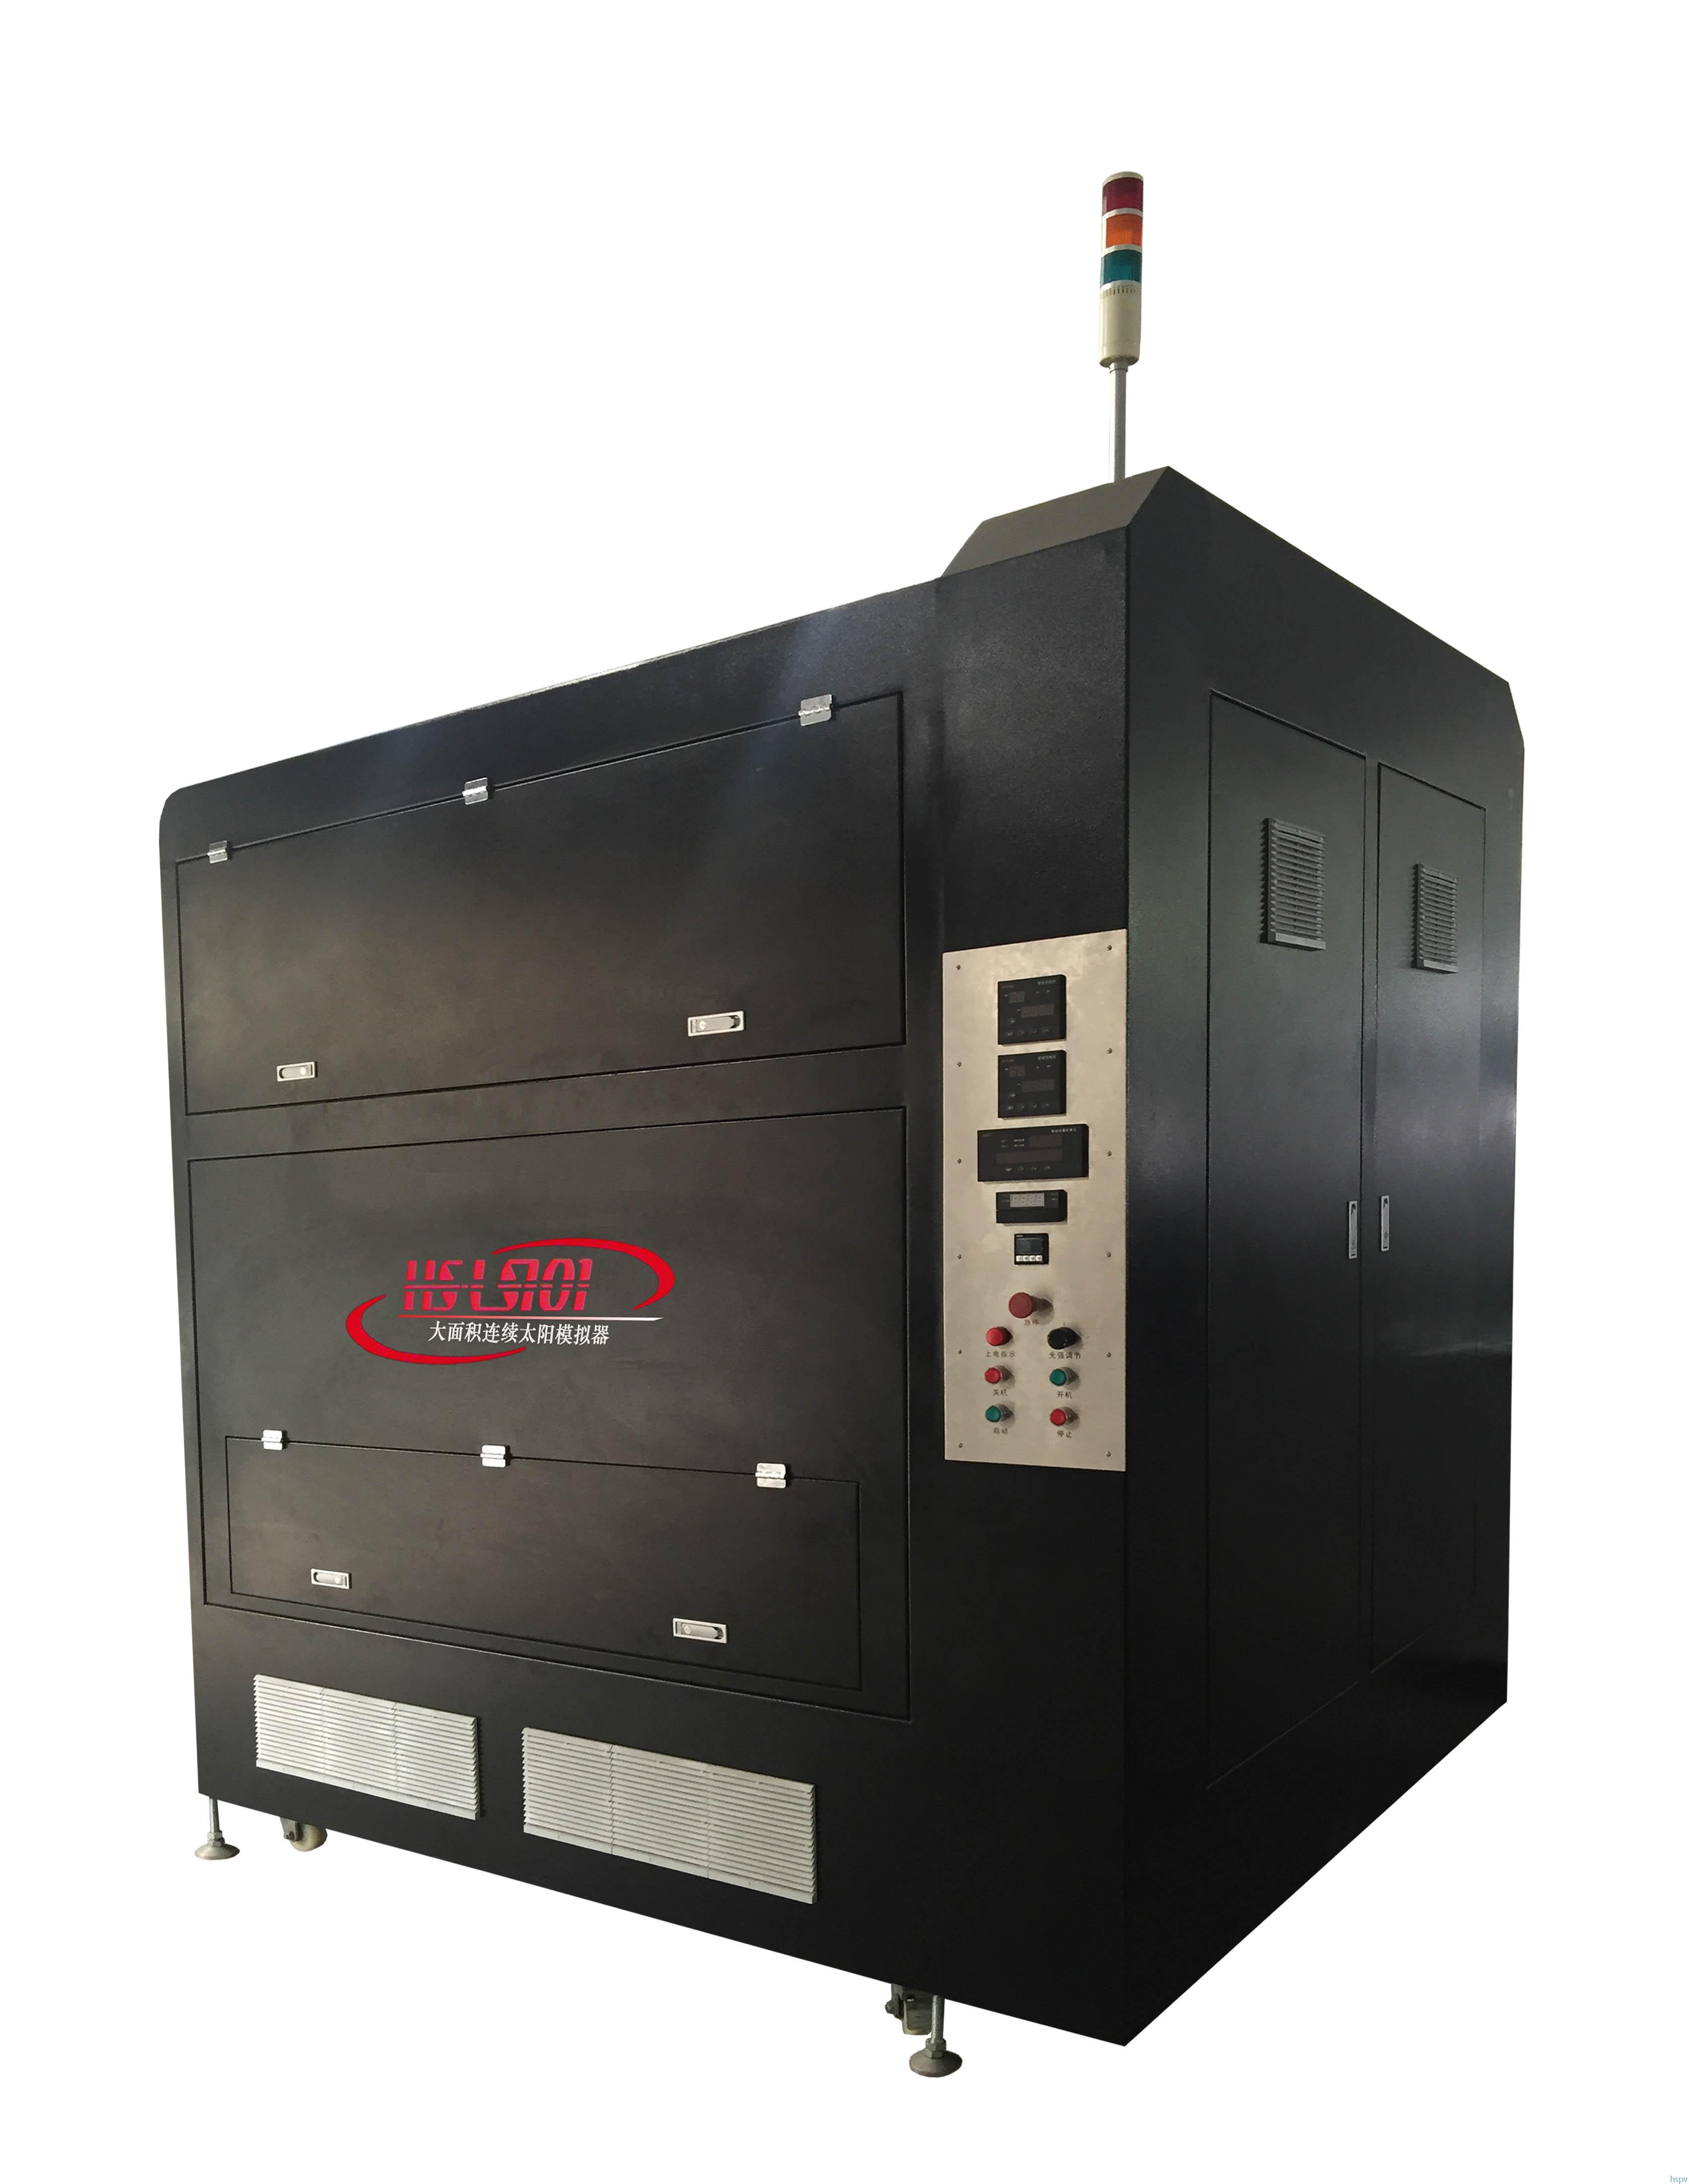 HSLS101 稳态太阳能模拟器